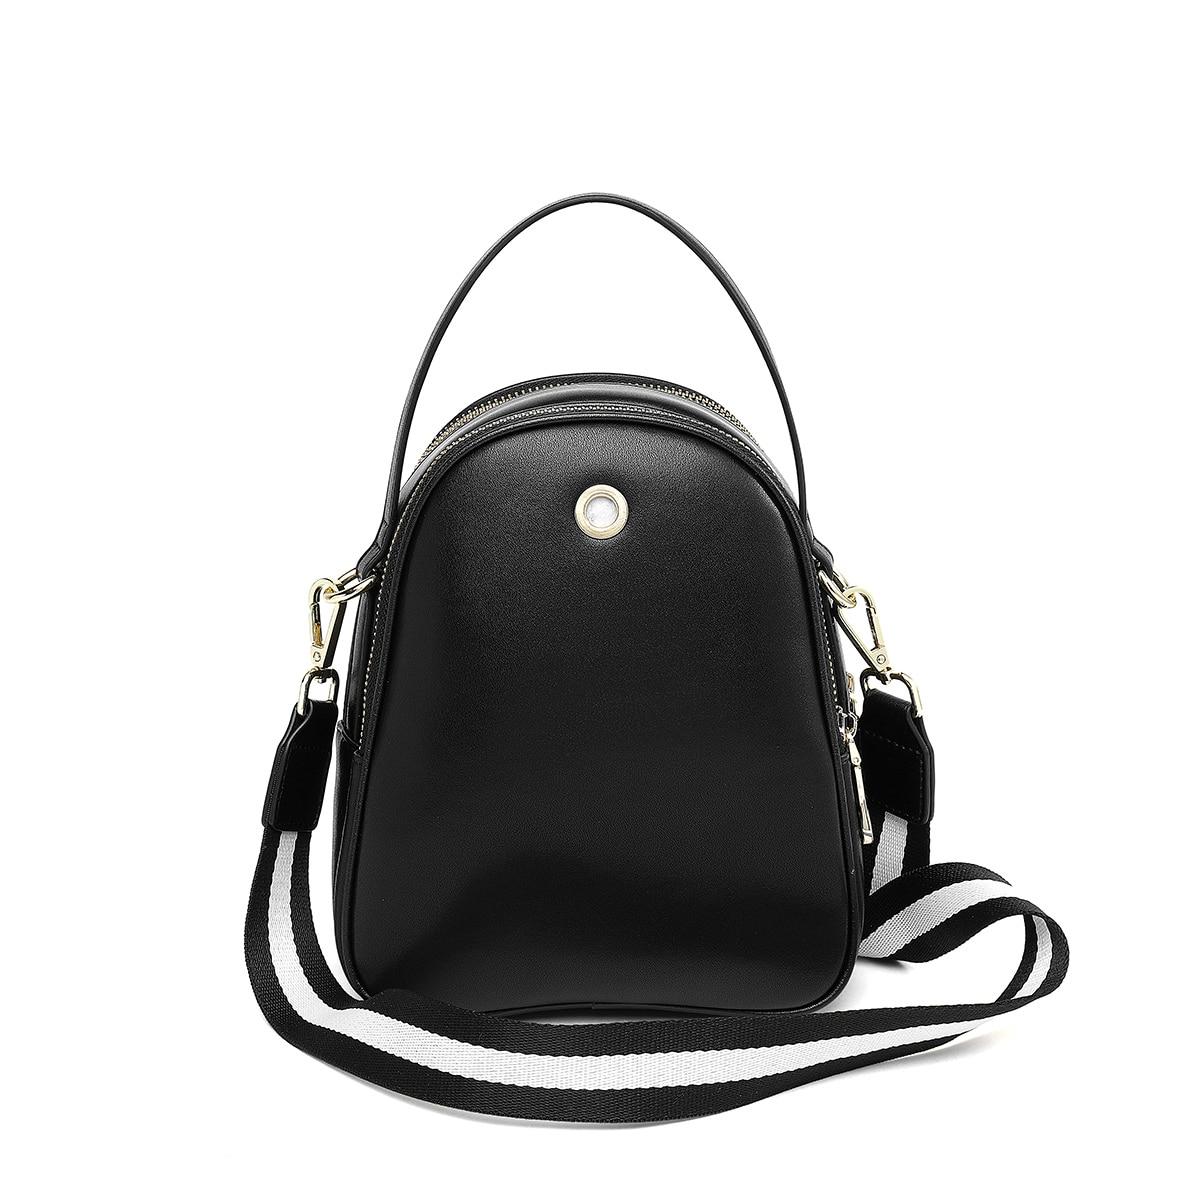 4 color backpack  backpack women  harajuku bag  cute  women BM43644 190416 yx4 color backpack  backpack women  harajuku bag  cute  women BM43644 190416 yx